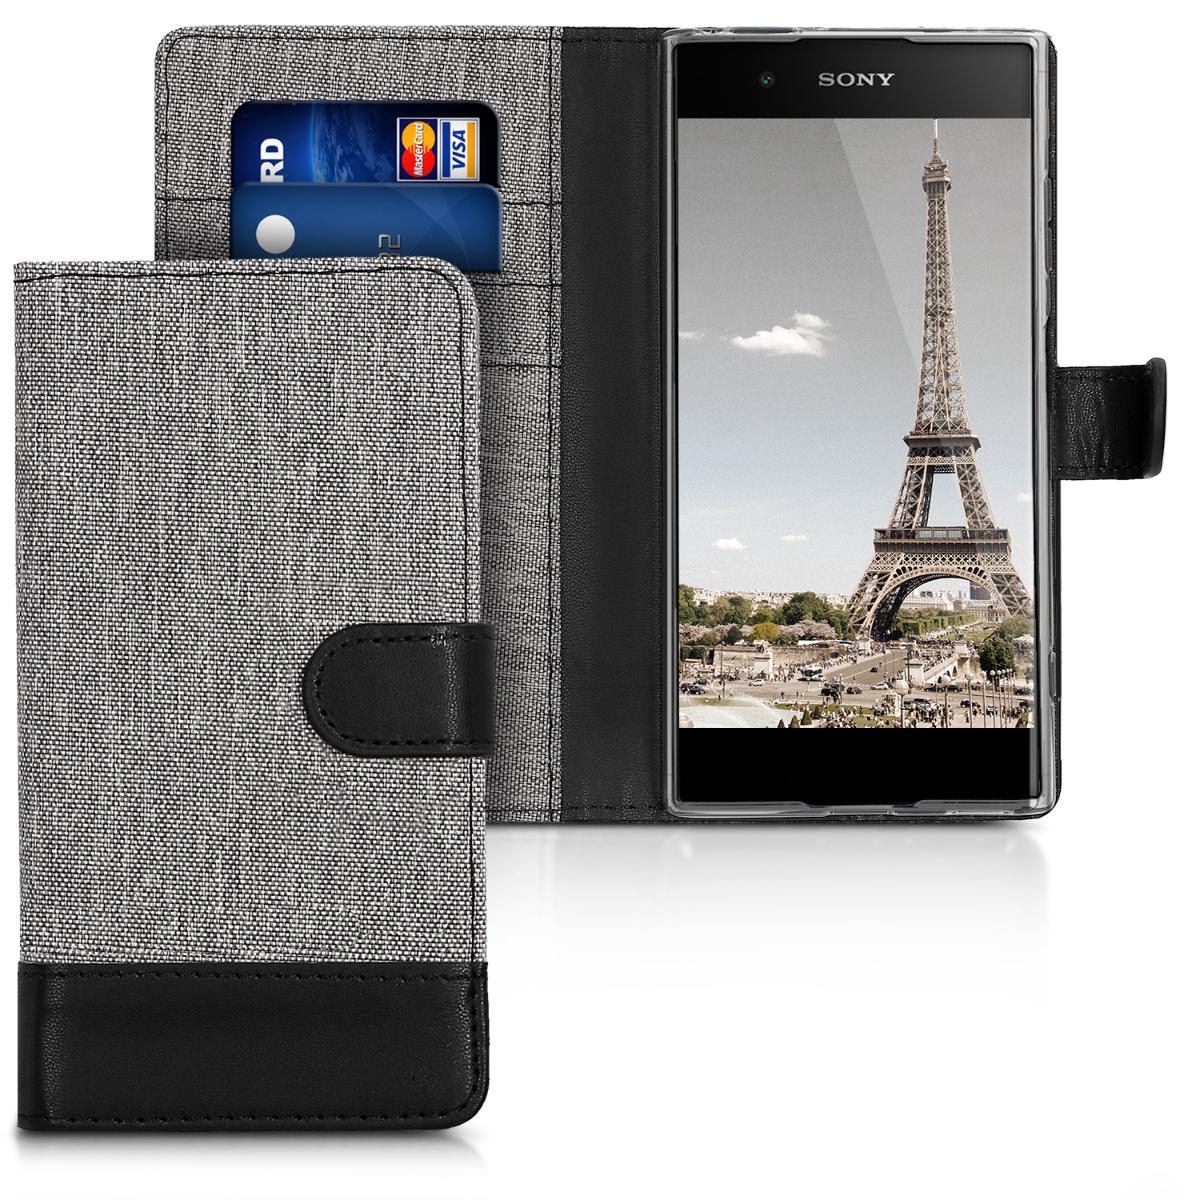 Textilní látkové pouzdro | obal pro Sony Xperia XA1 Plus - šedé/ černé